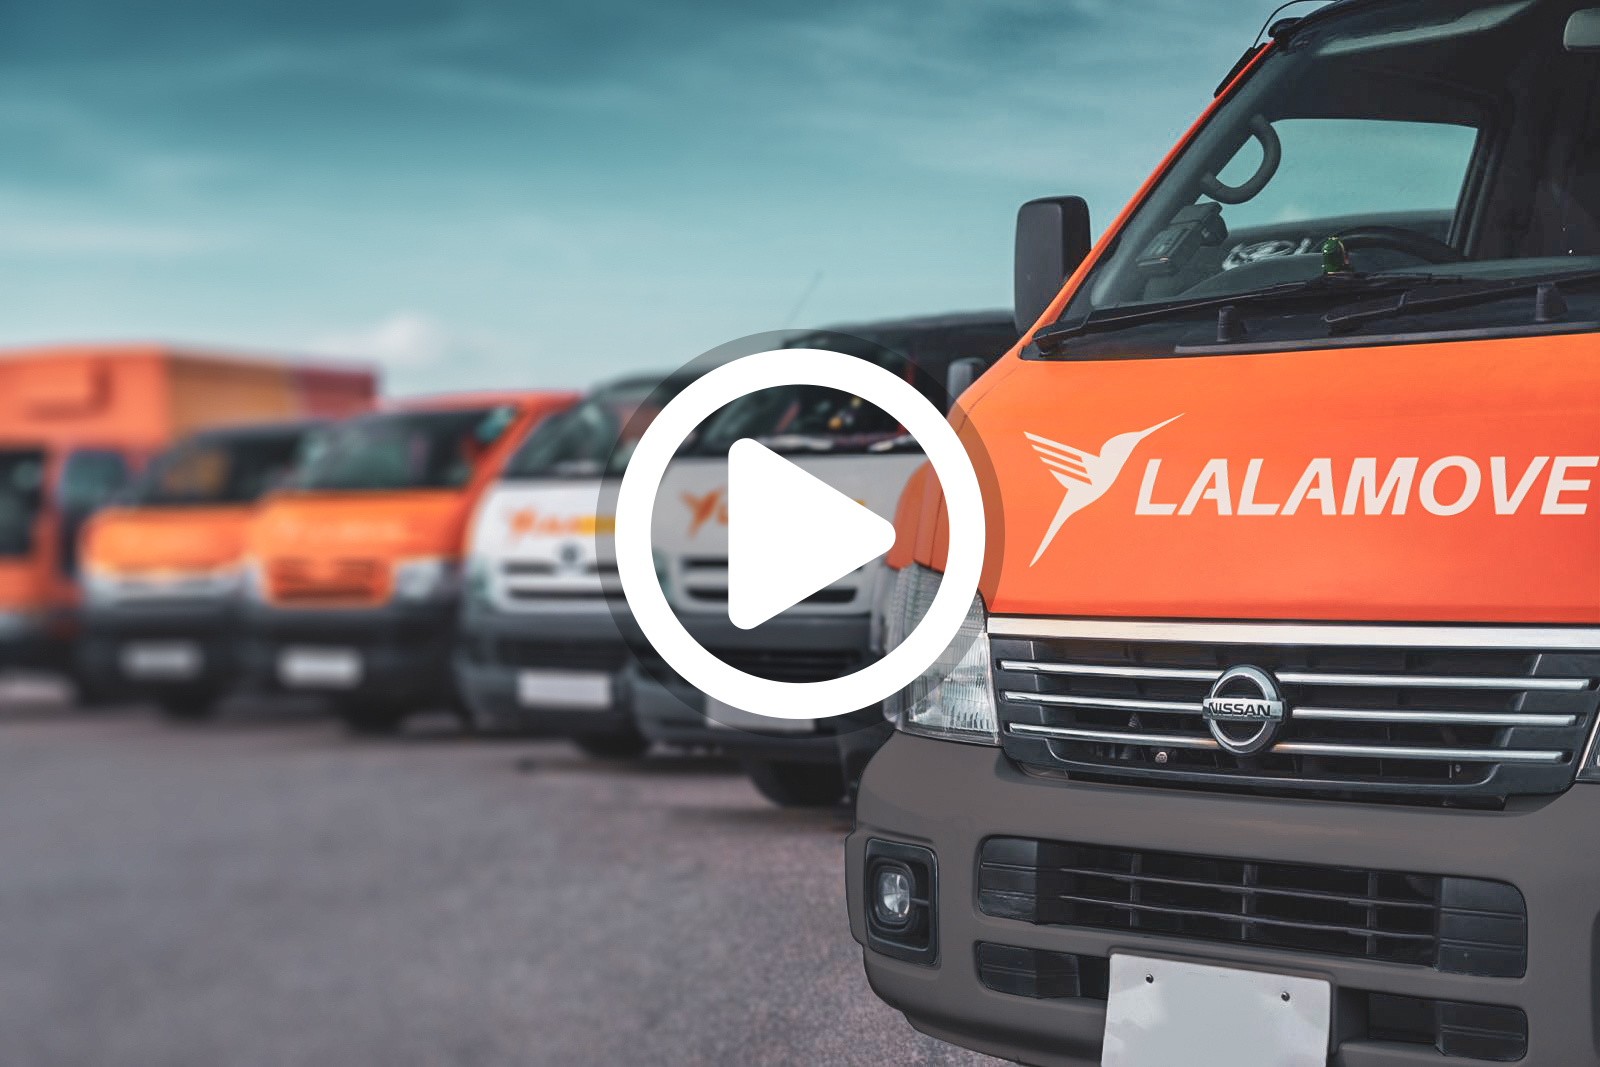 Lalamove vans